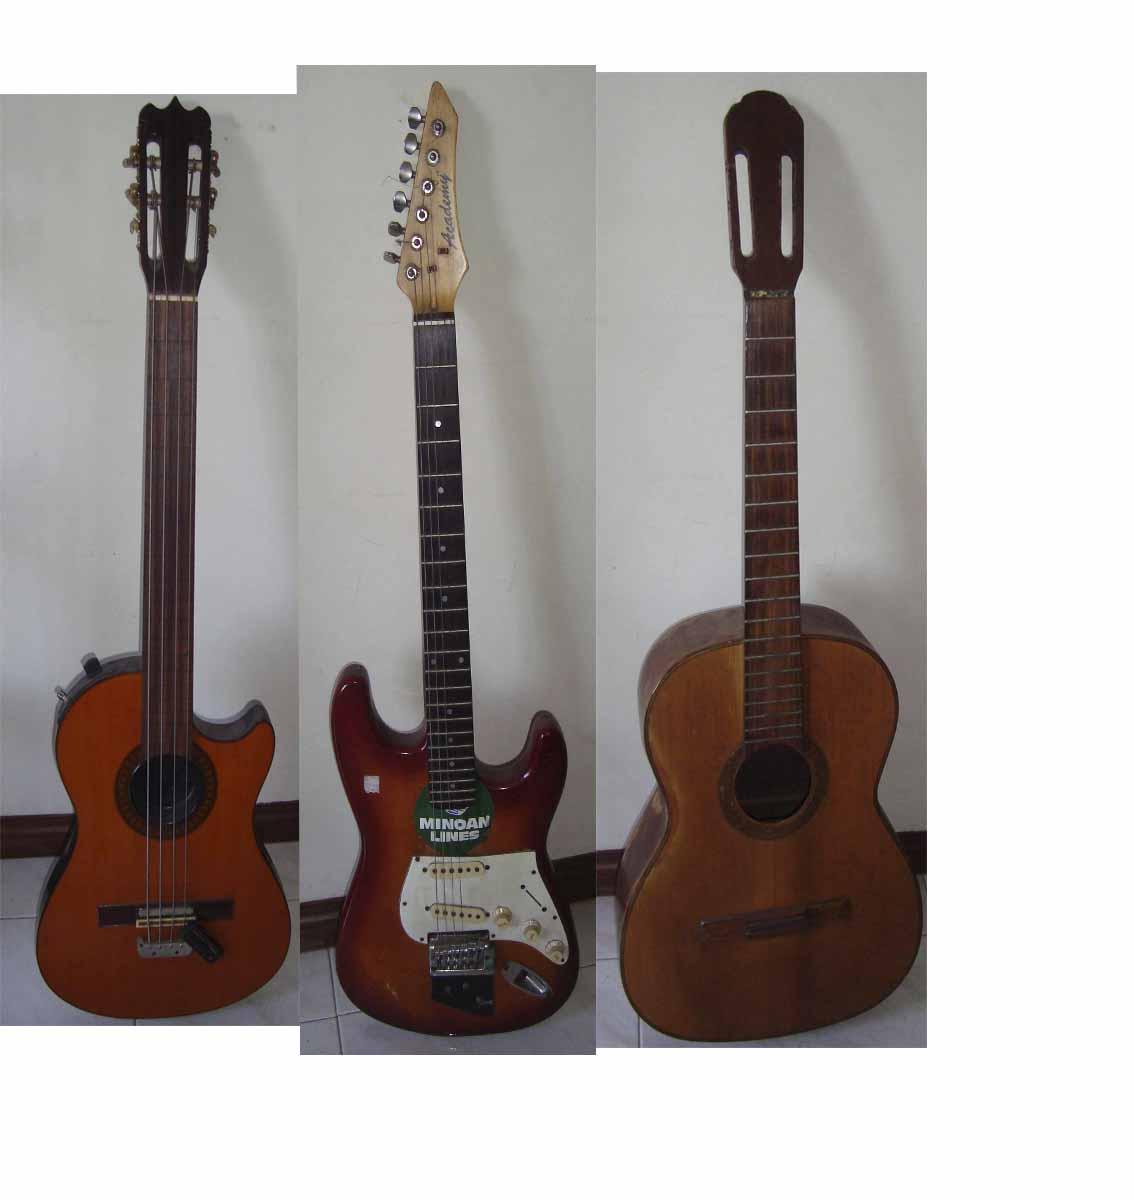 Baratuxo diversos junho 2011 for Guitarras electricas baratas